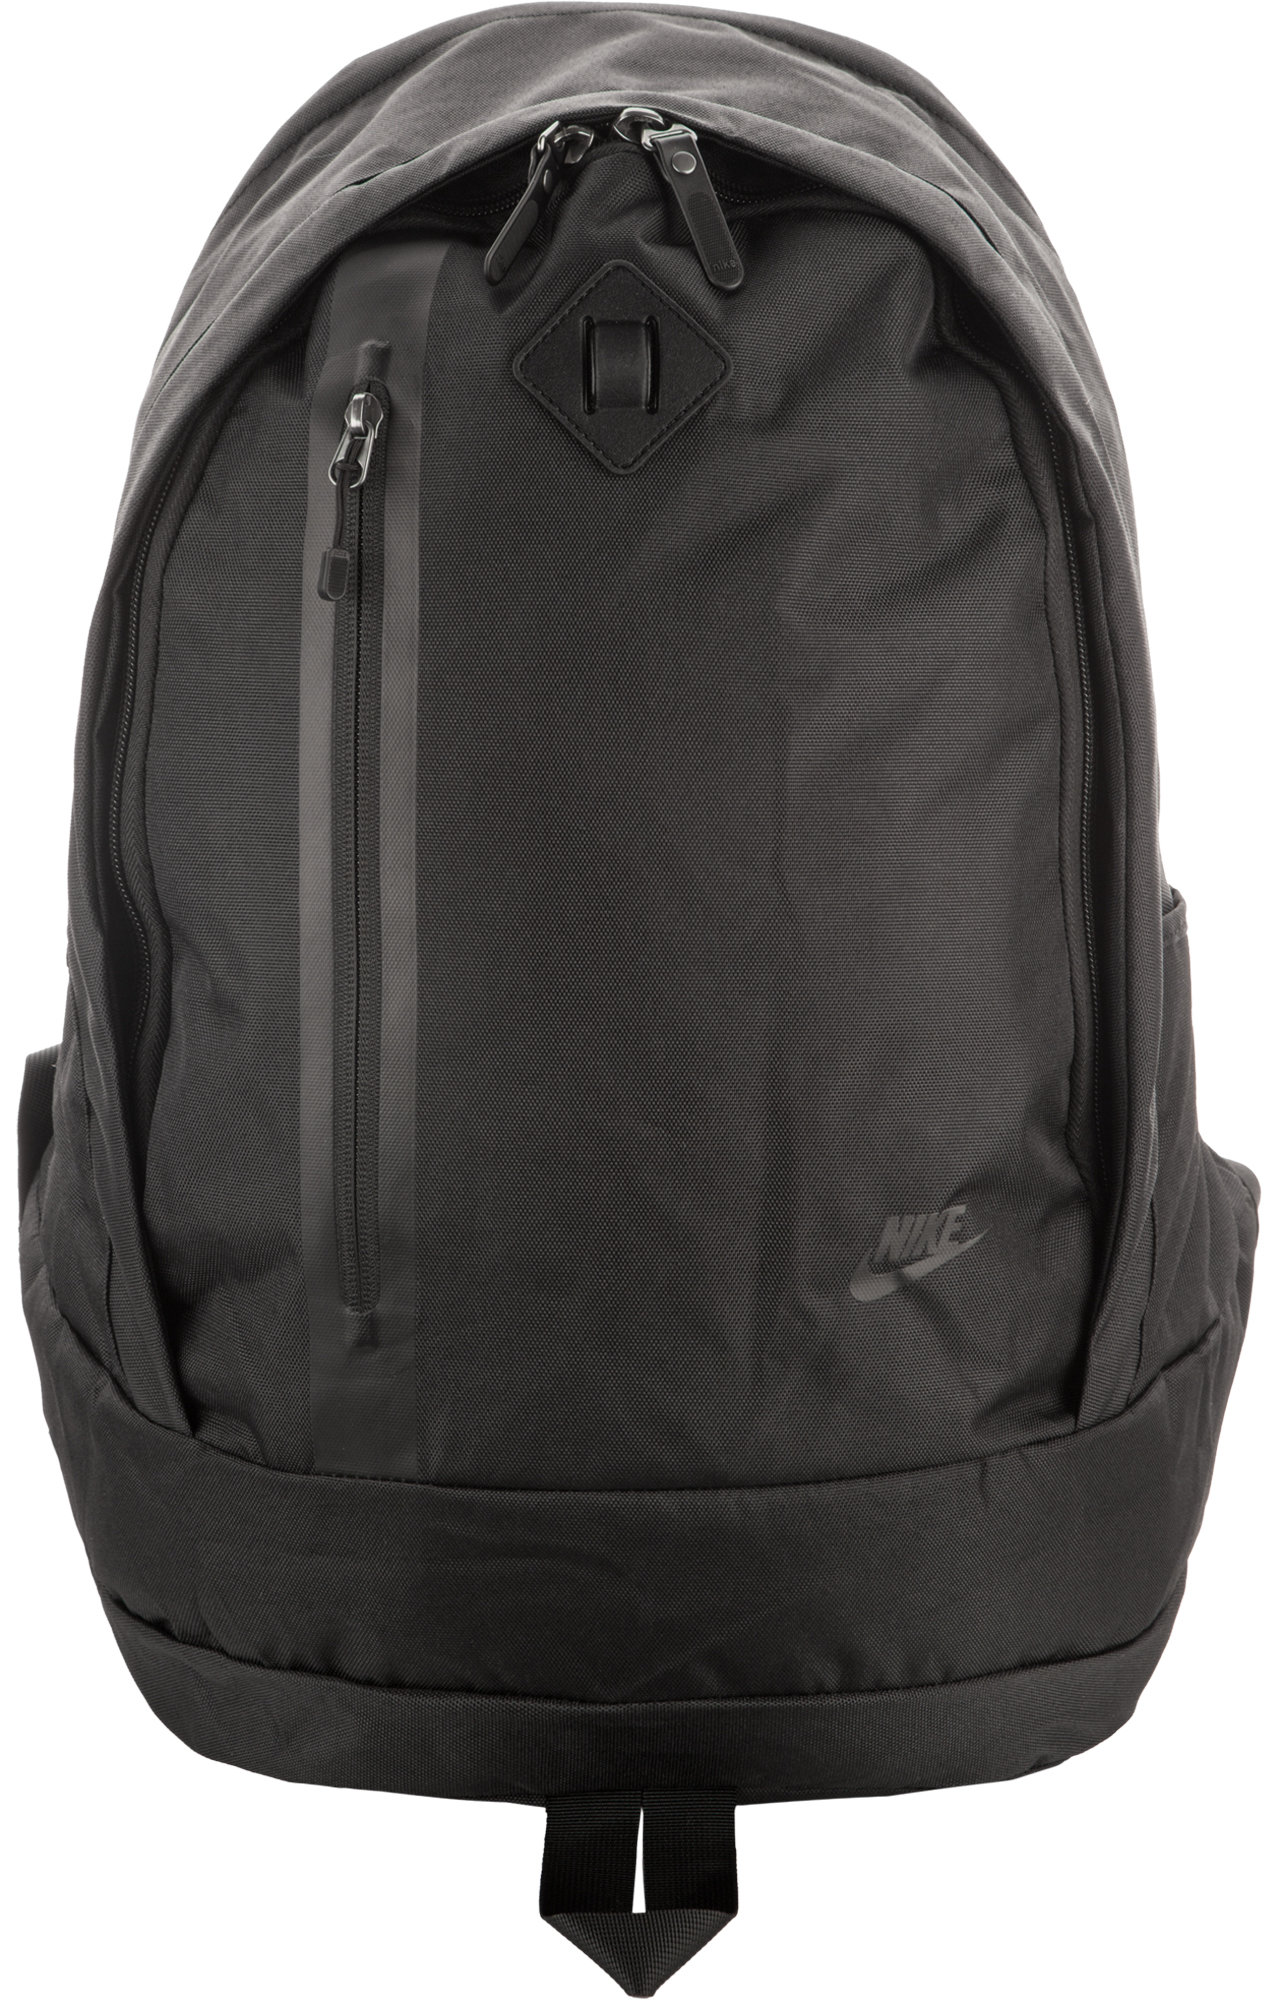 Рюкзак Nike Cheyenne 3.0 Solid